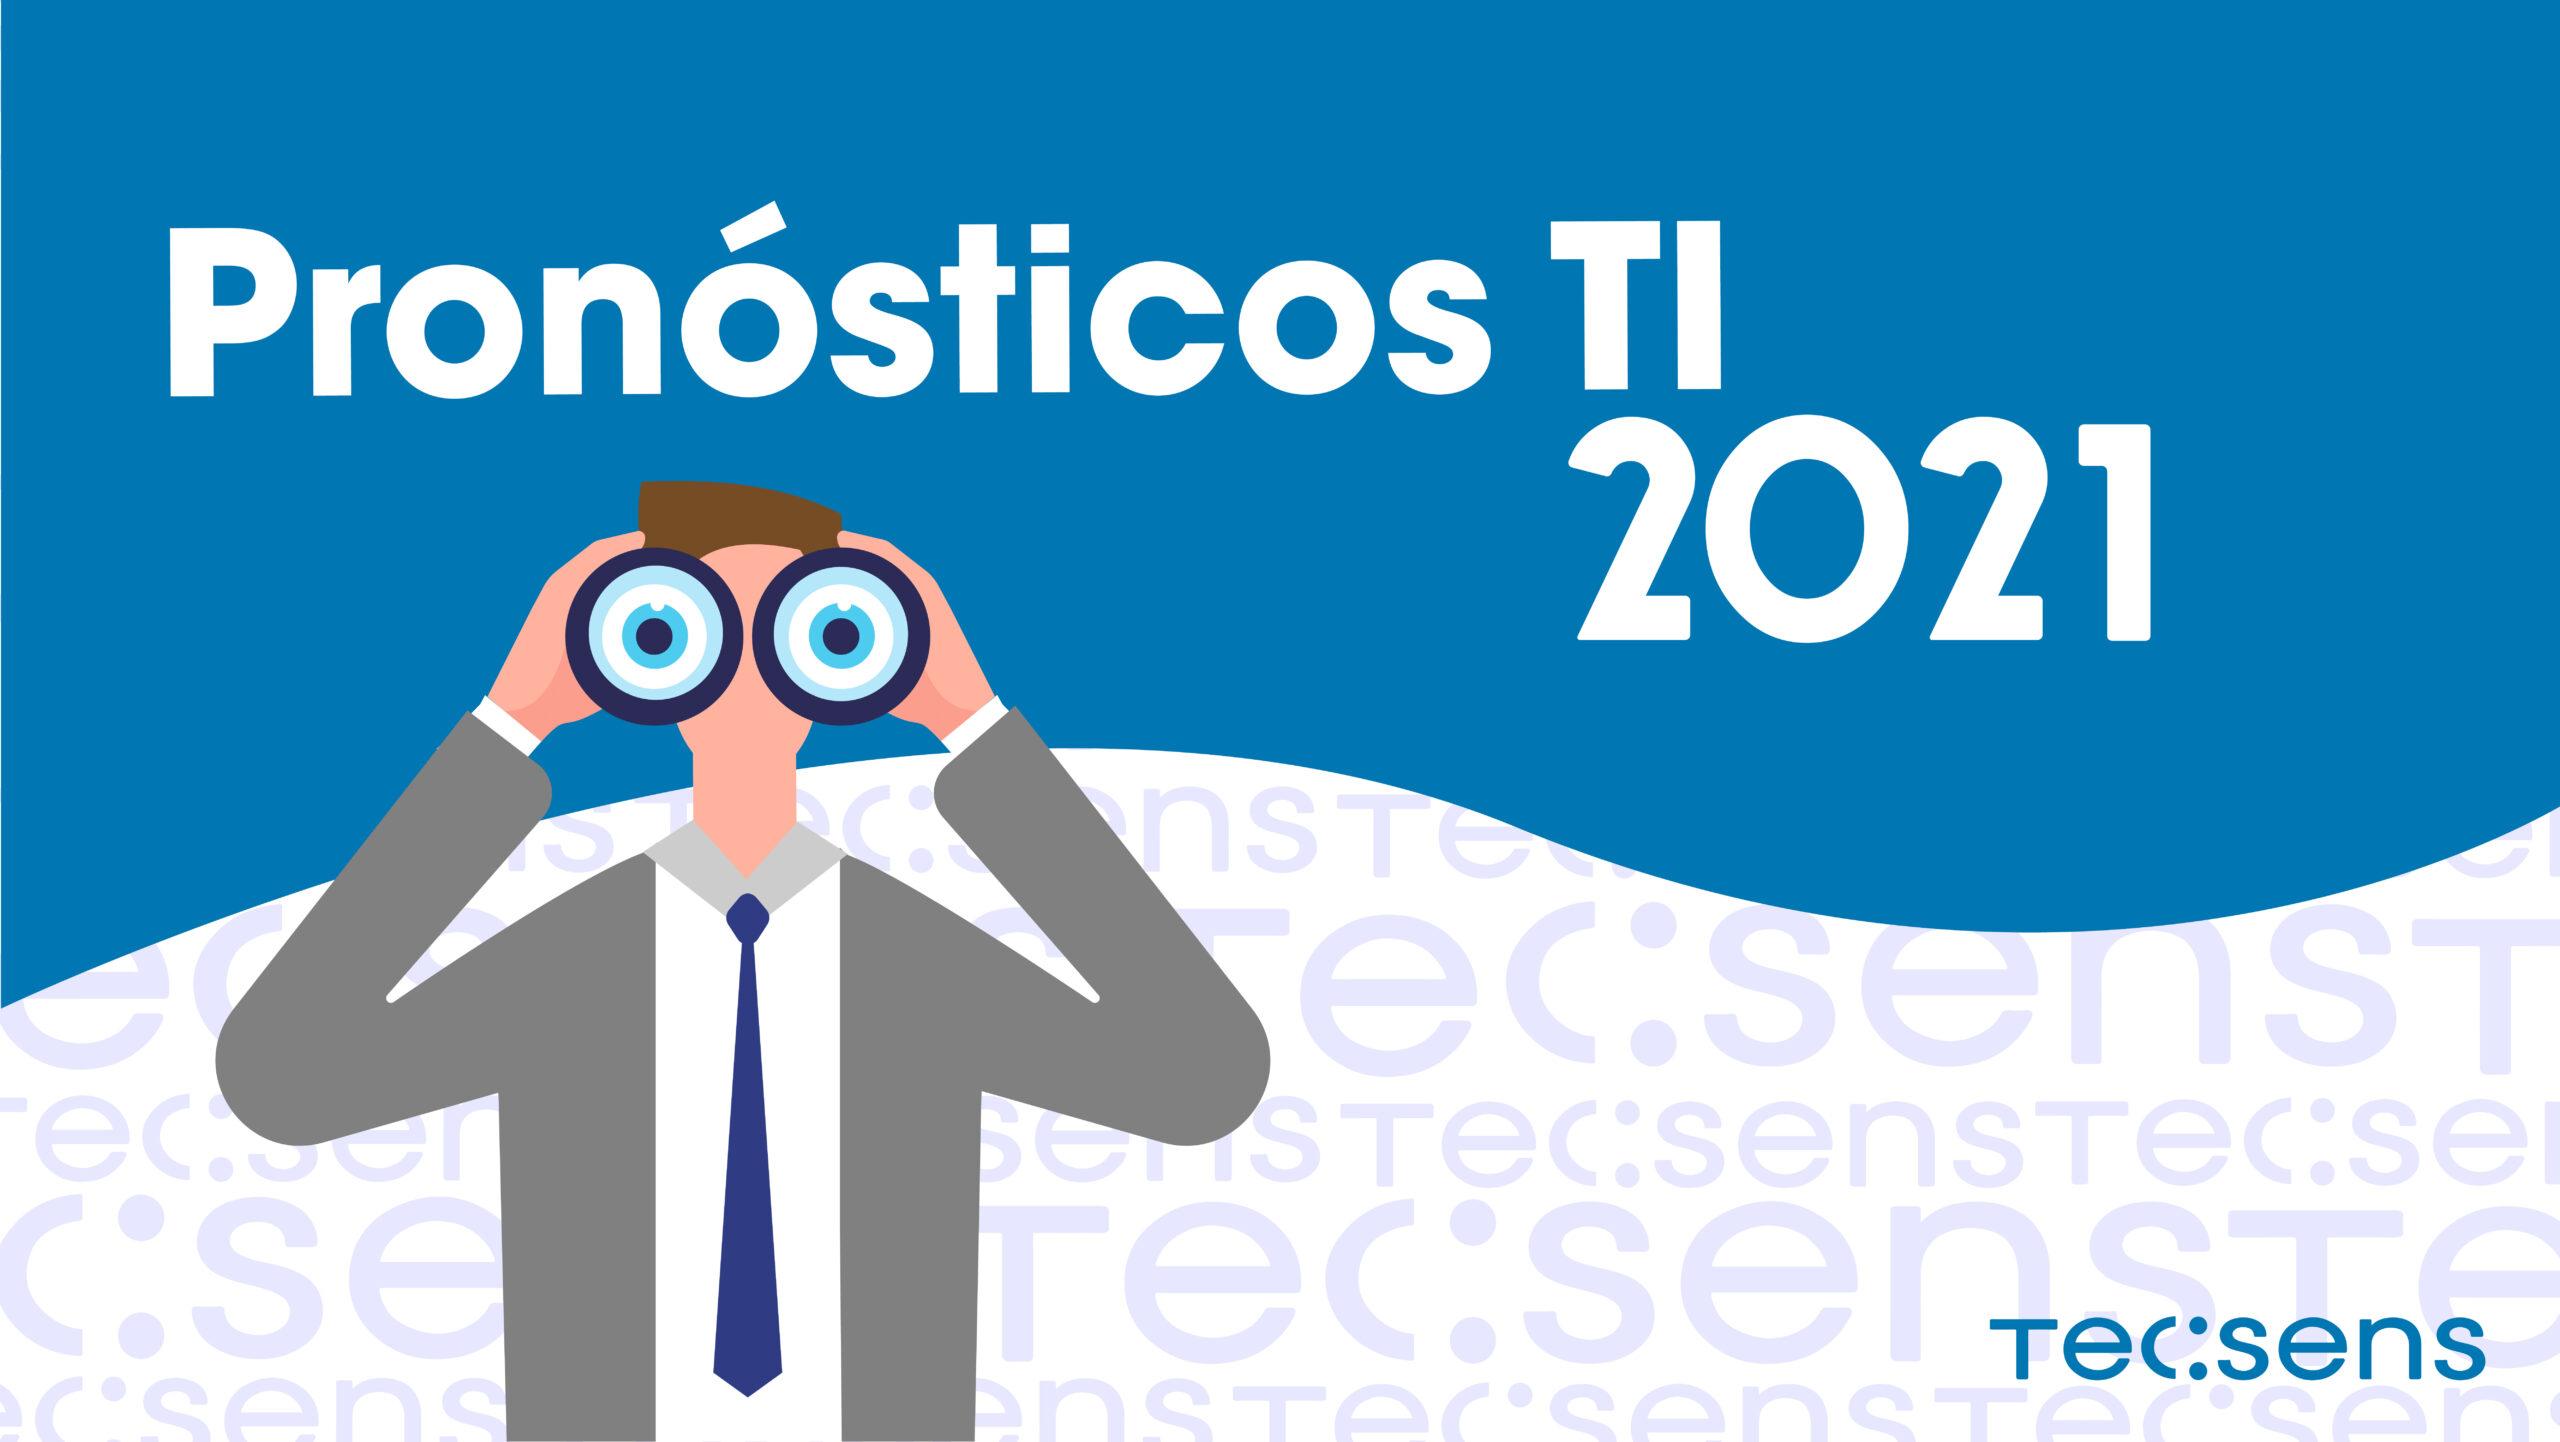 Pronòstics TI 2021